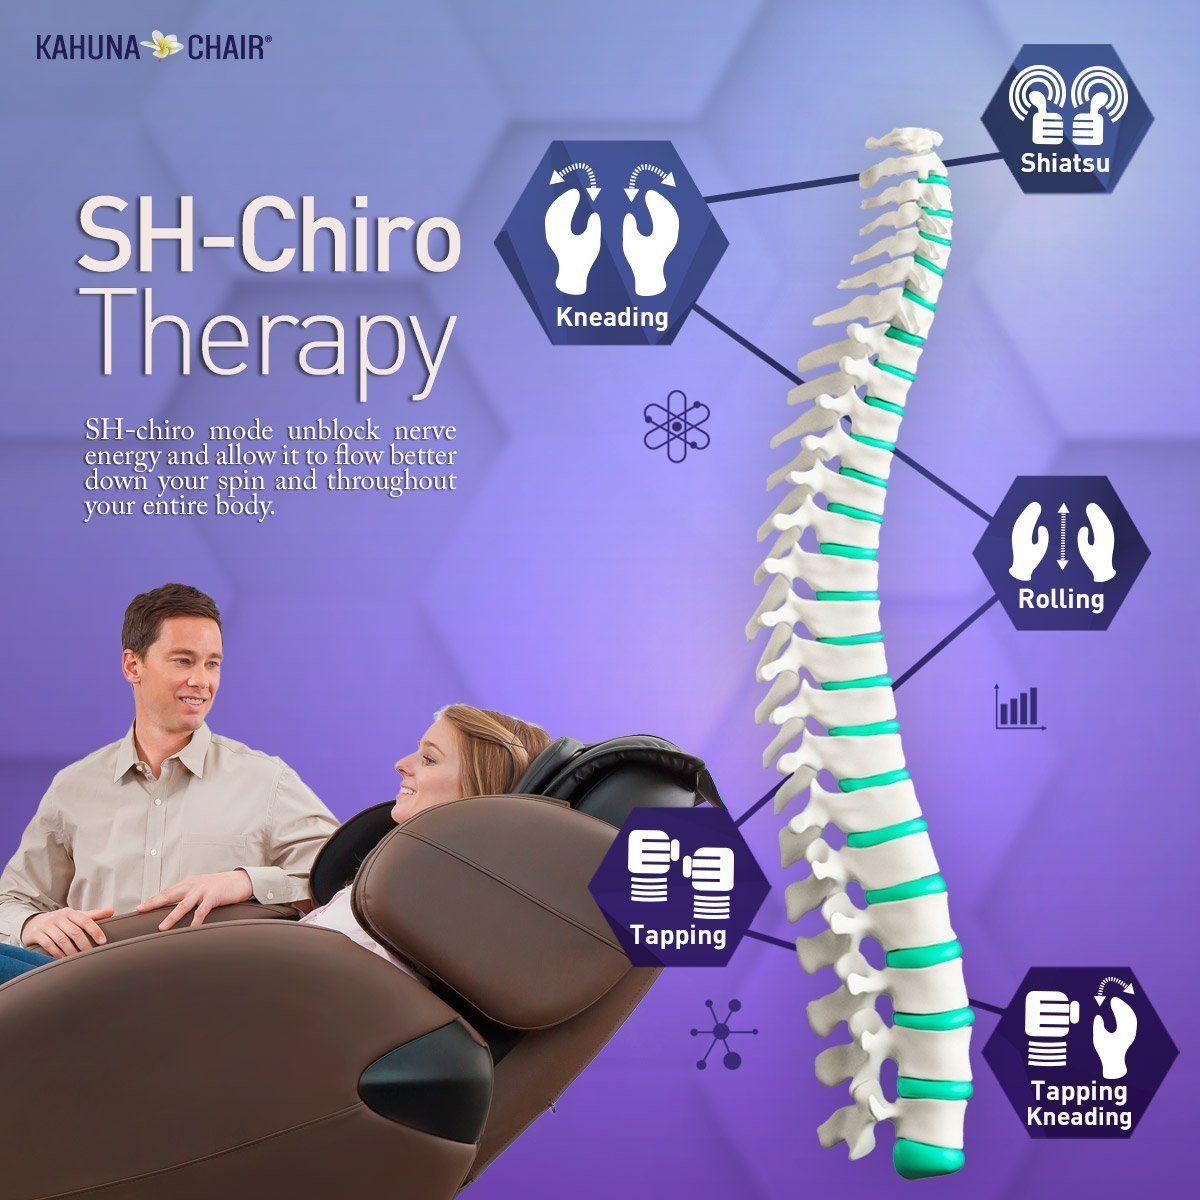 Zero_Gravity_Kahuna_Massage_Chair_LM-6800